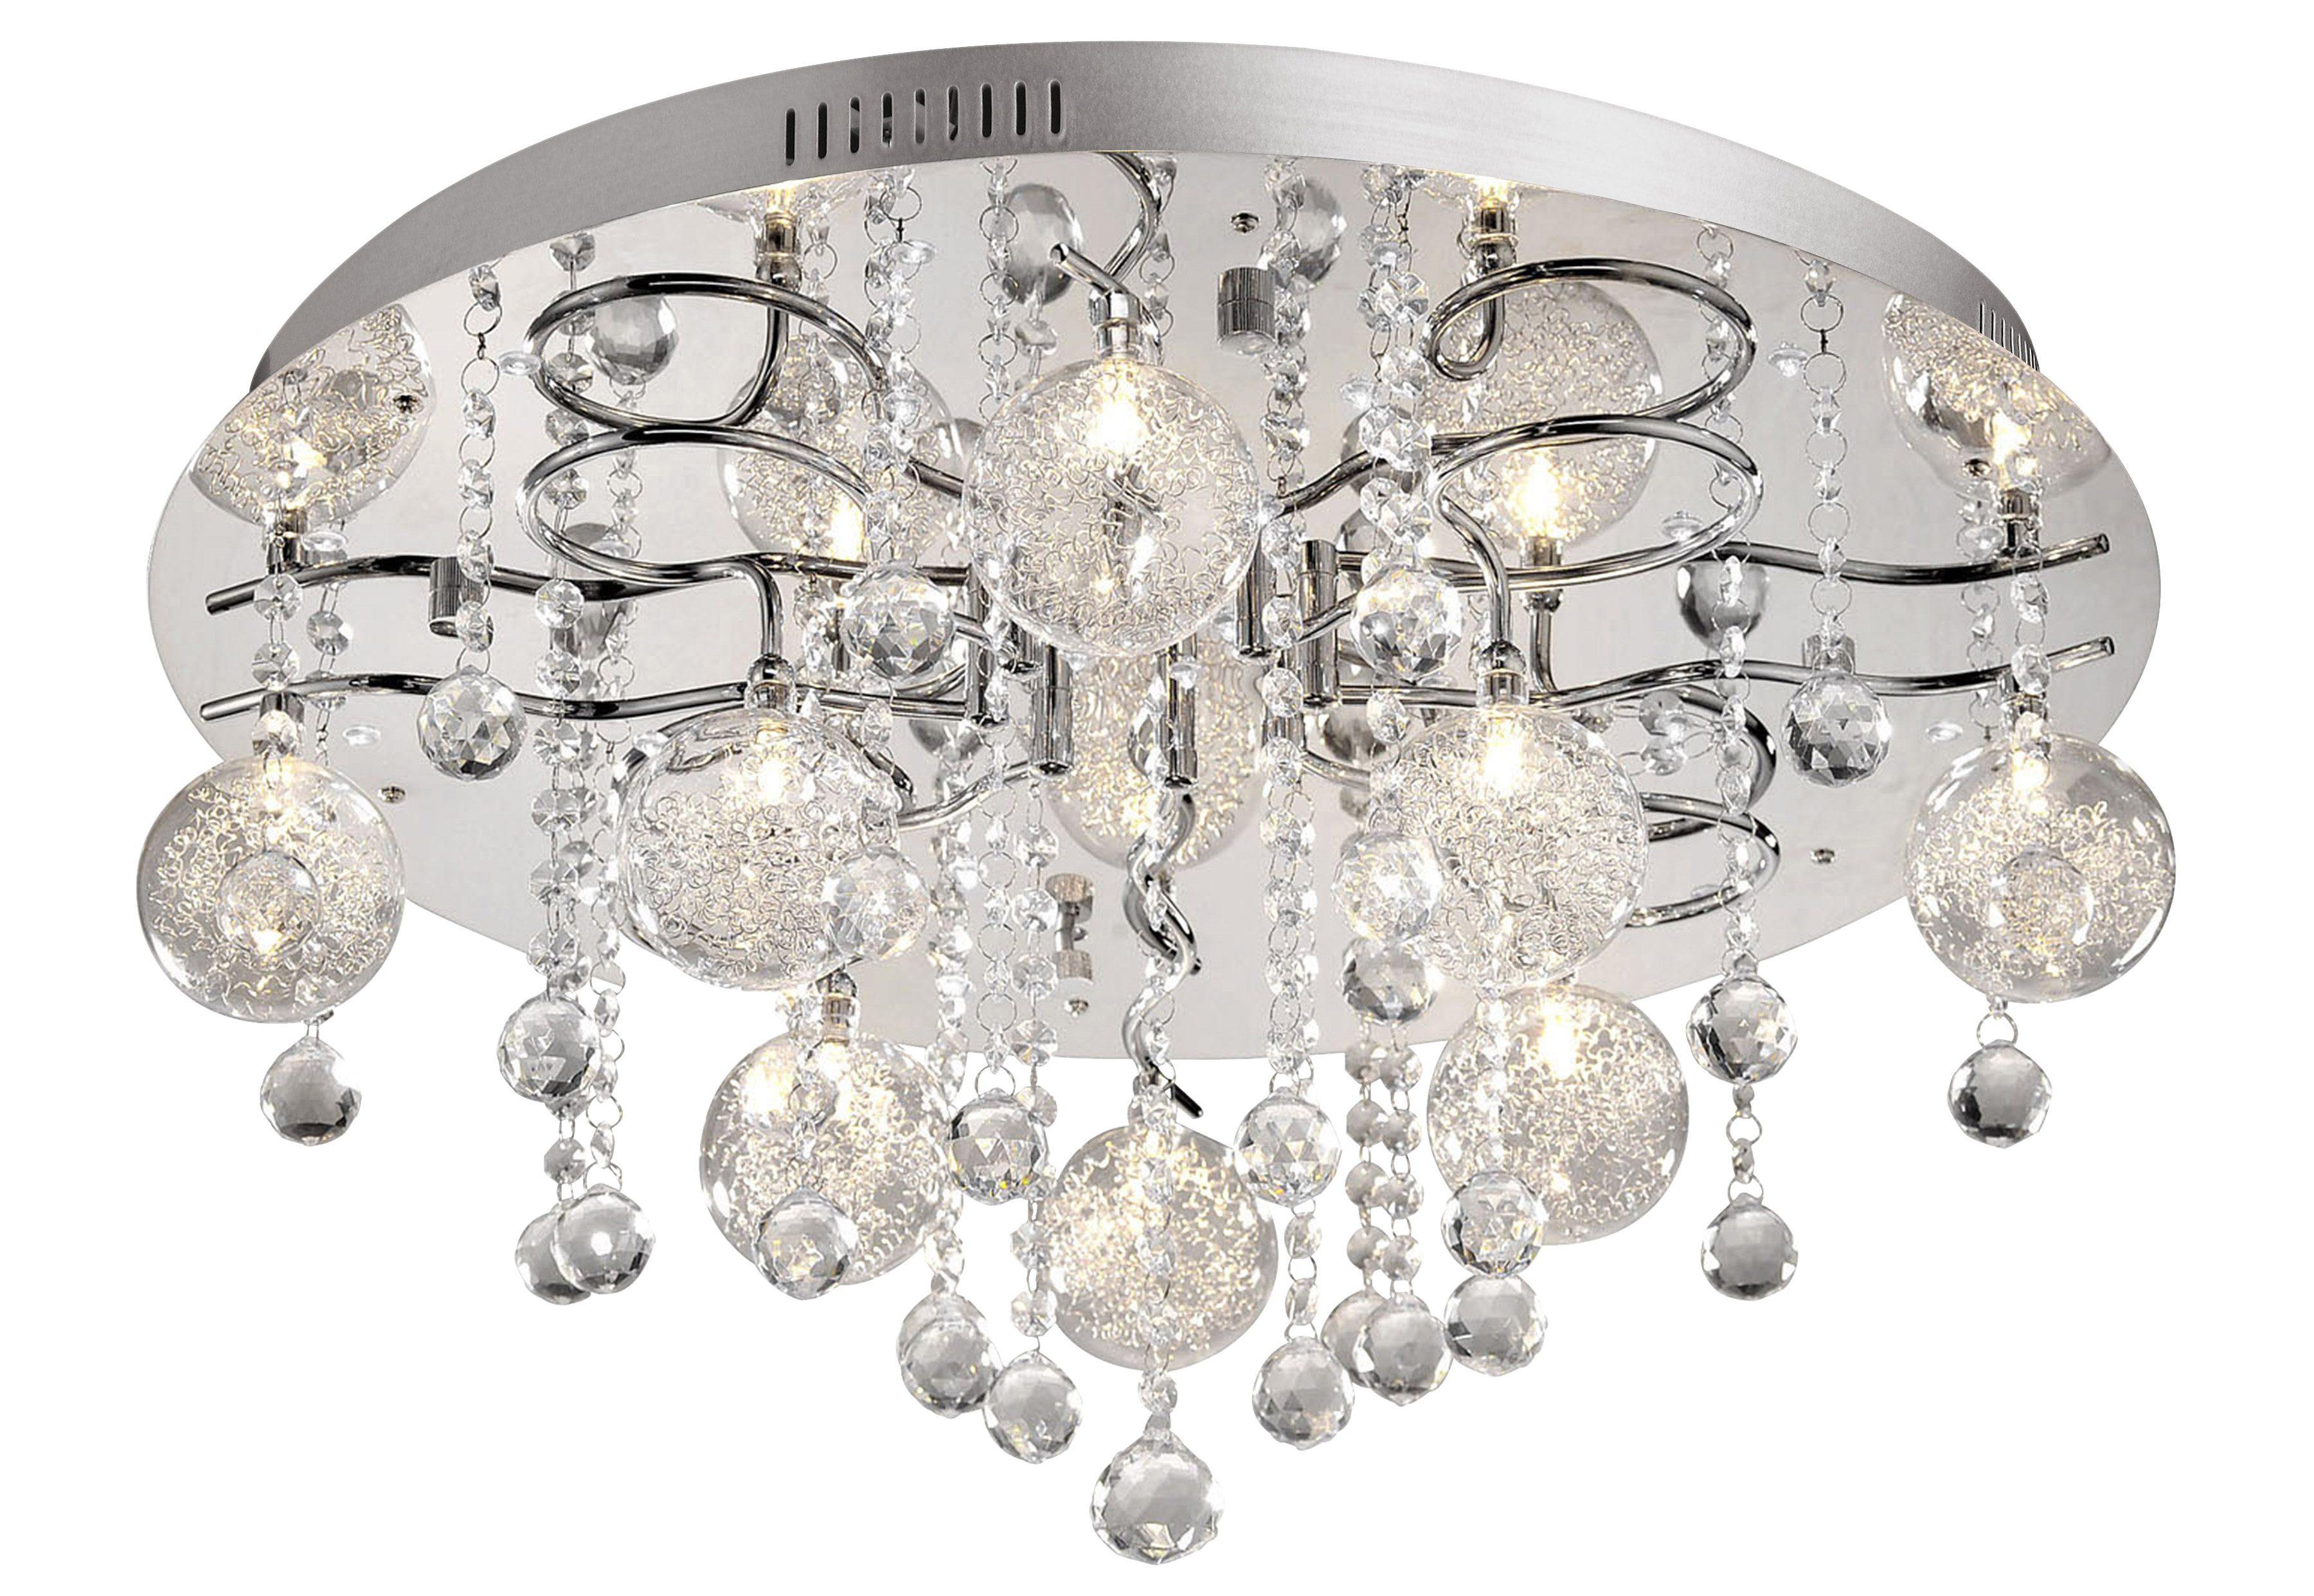 Paul Neuhaus LED-Deckenleuchte, »KALLISTO«